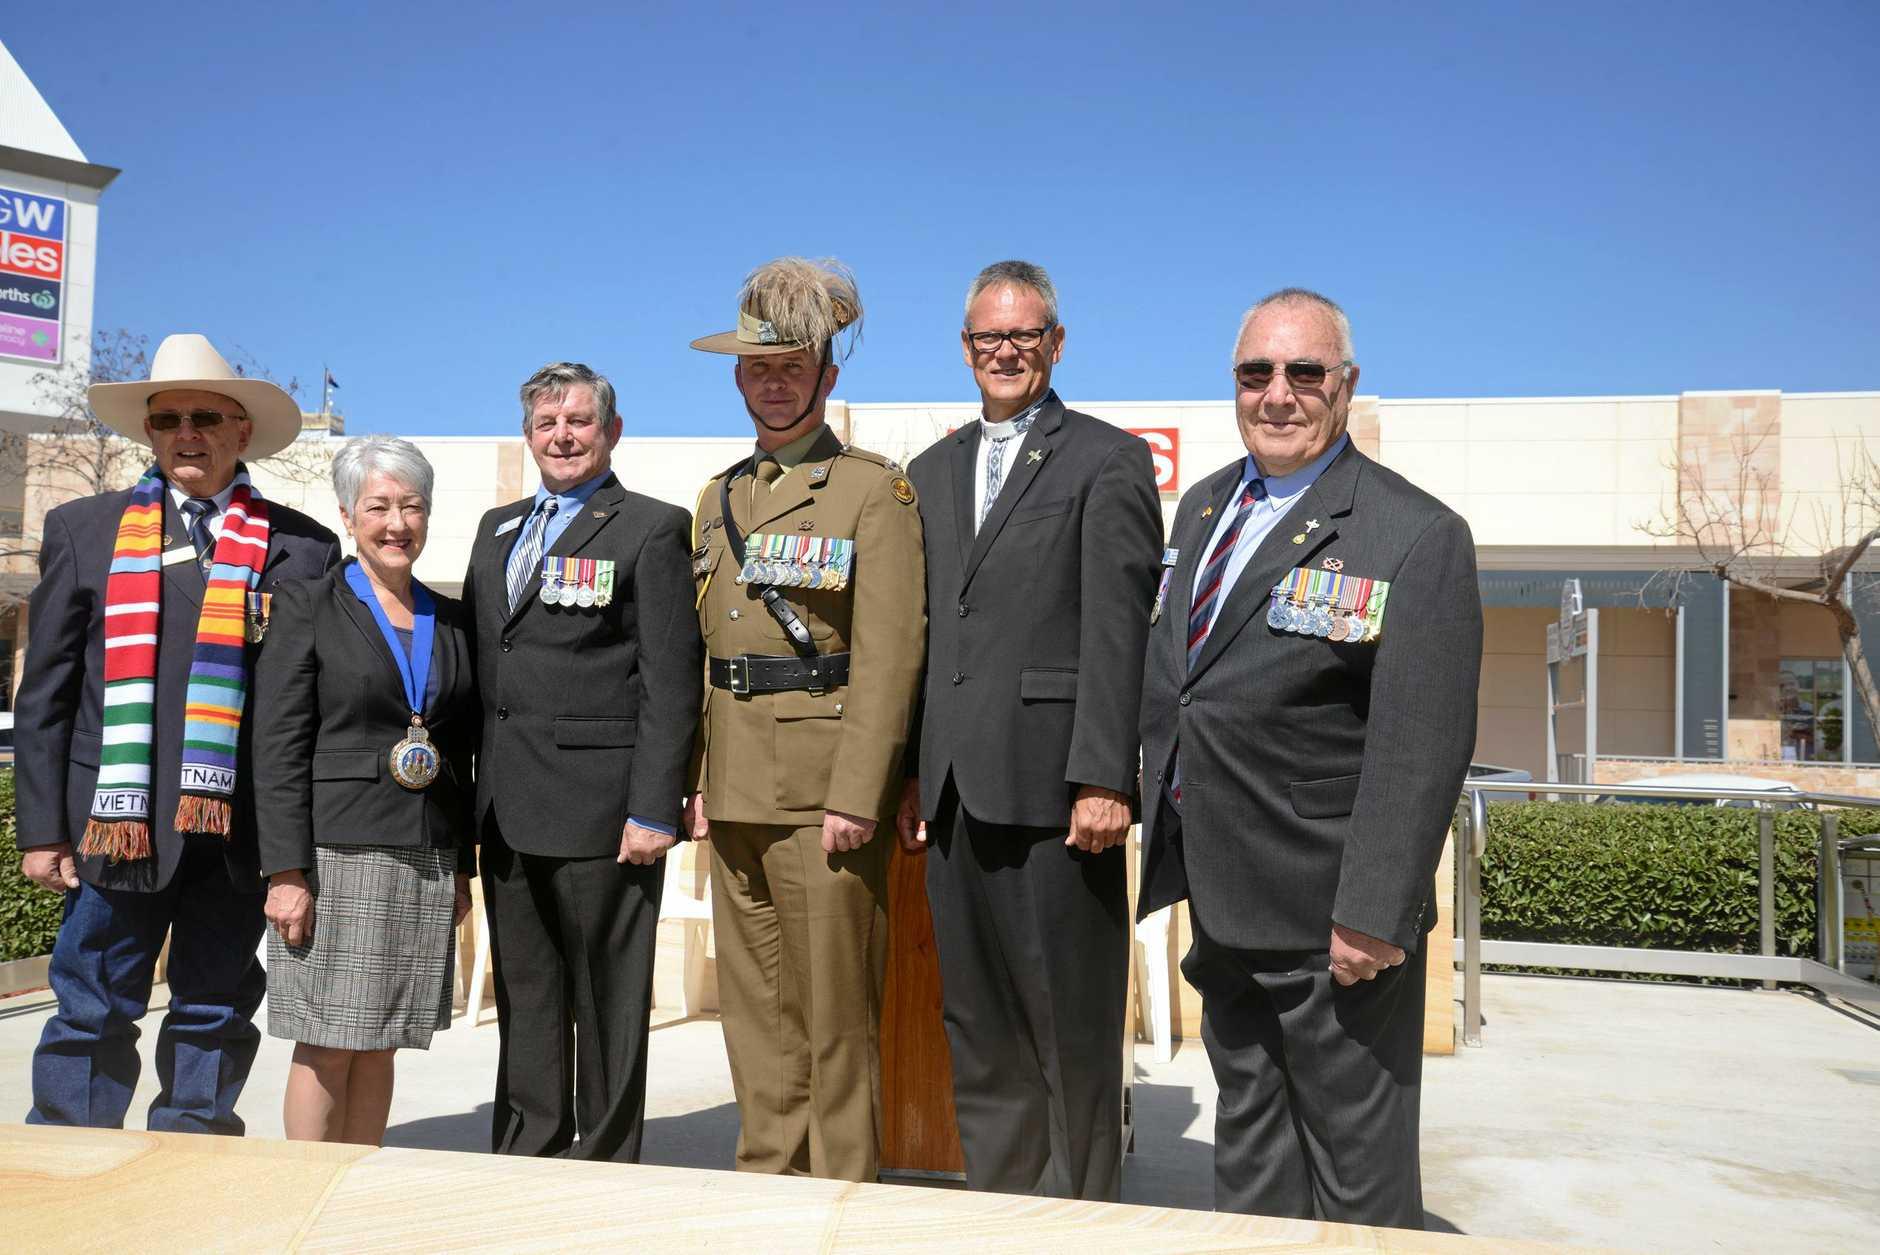 REMEMBERING: John Skinner (Warwick RSL sub branch), Cr Tracy Dobie (SDRC), Ken Ashton (SDESA), Major Grant Prendergast, Rev Willie Liebenberg and Barry Kelly (SDESA) at Leslie Park at the Vietnam Veterans' Day Remembrance Service.